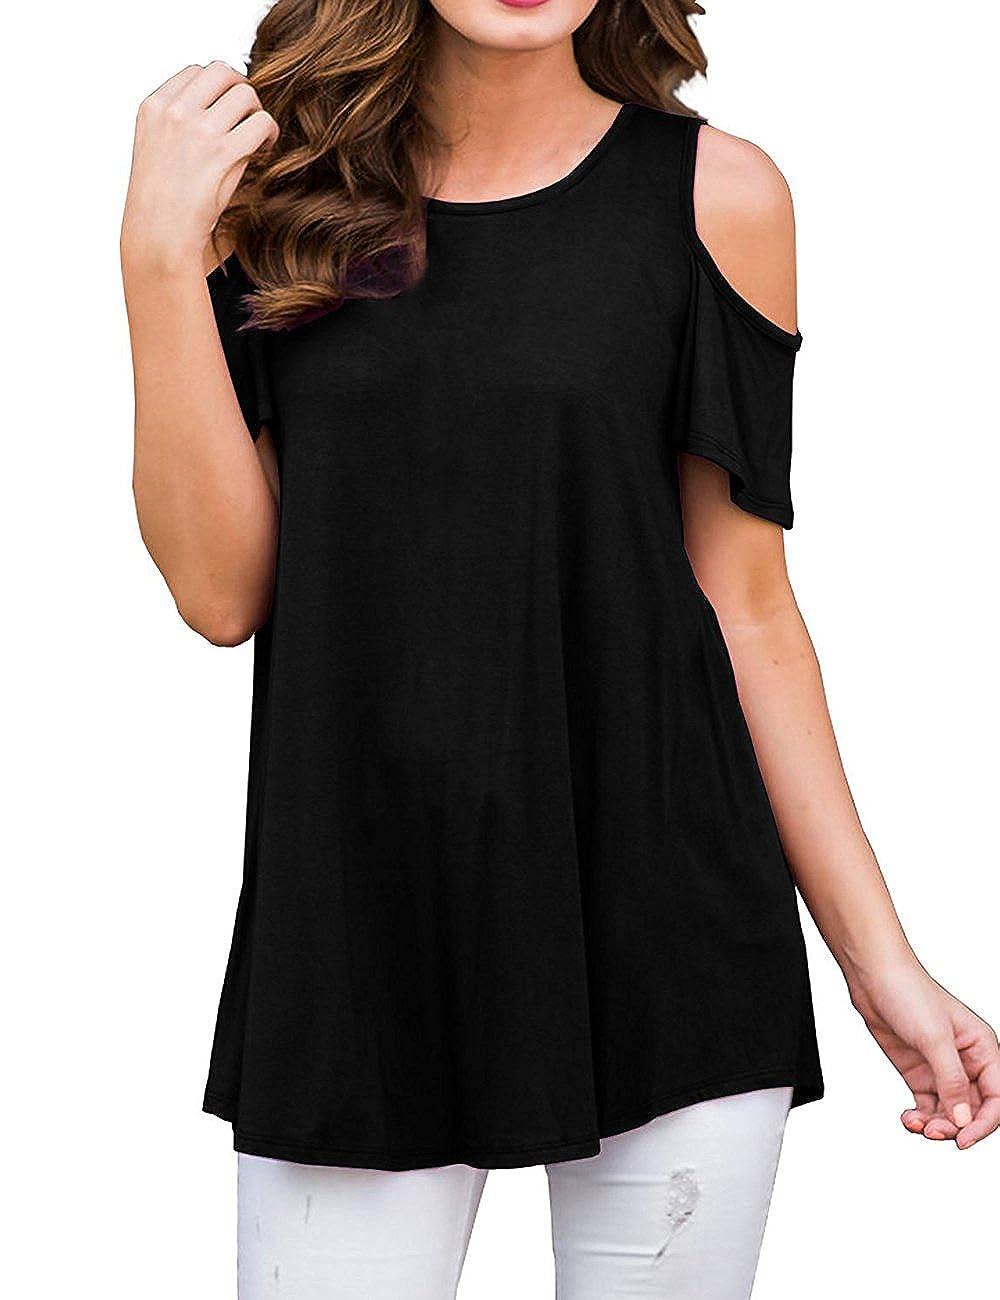 Black ACKKIA Women Navy Casual Floral Print Cold Shoulder Short Sleeve Blouse Shirt Top